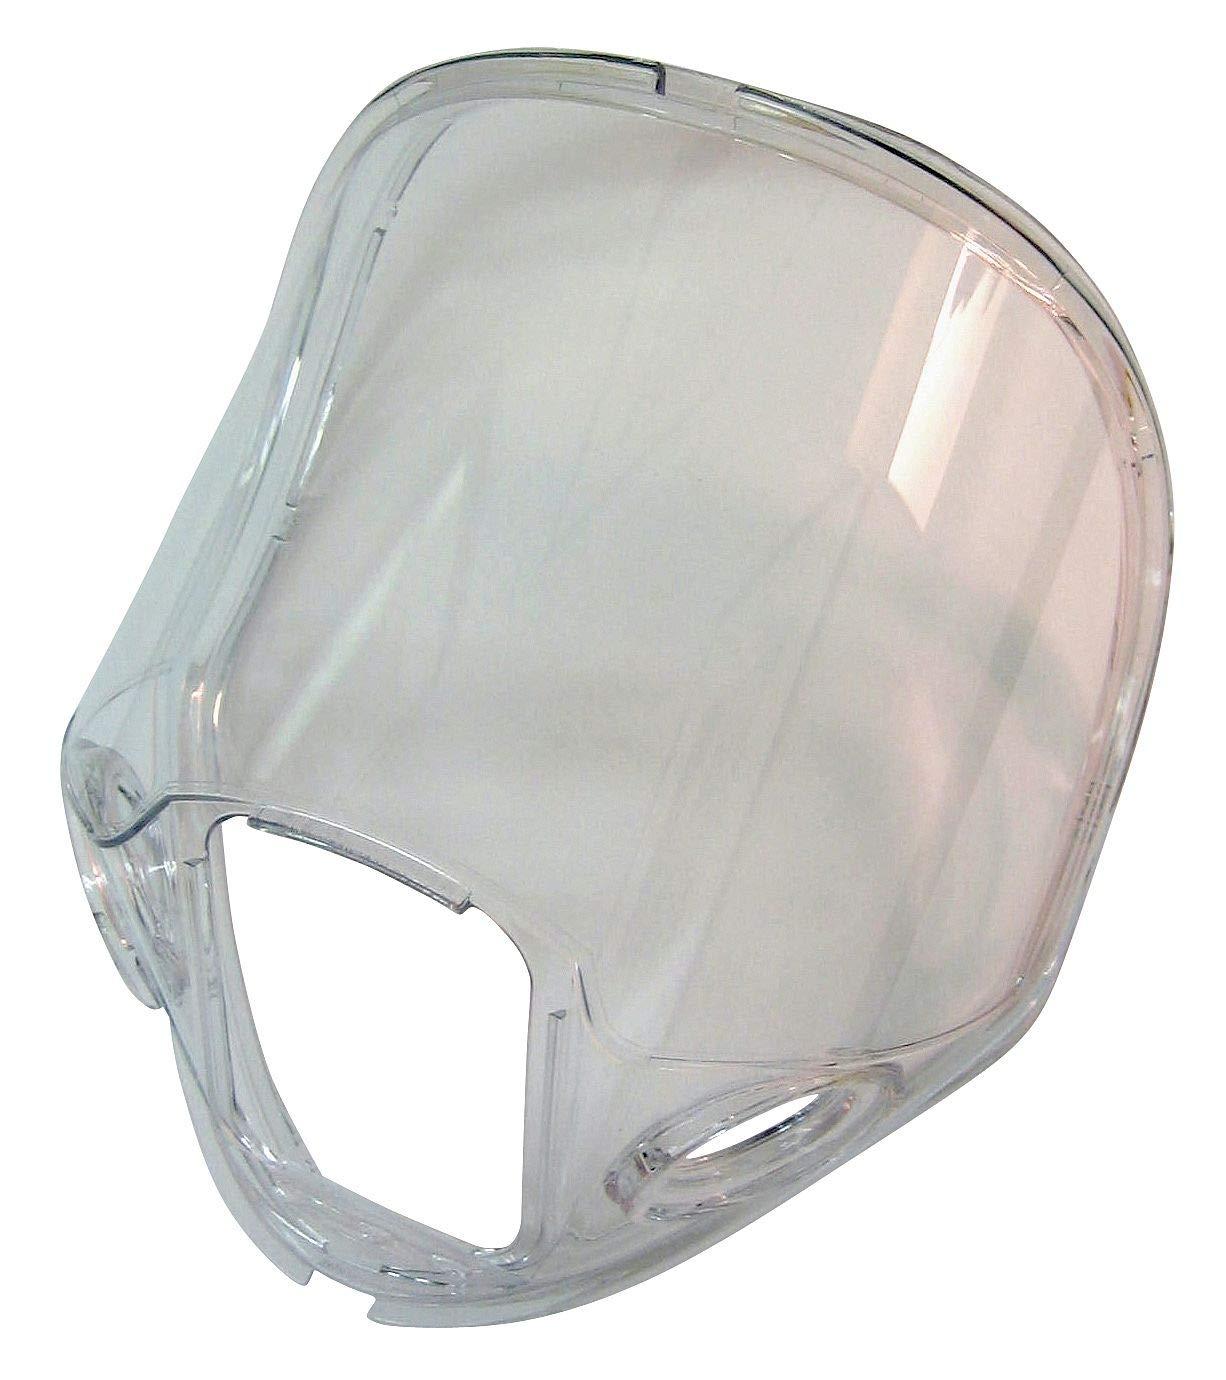 Allegro Respirator Lens - 9901-09L